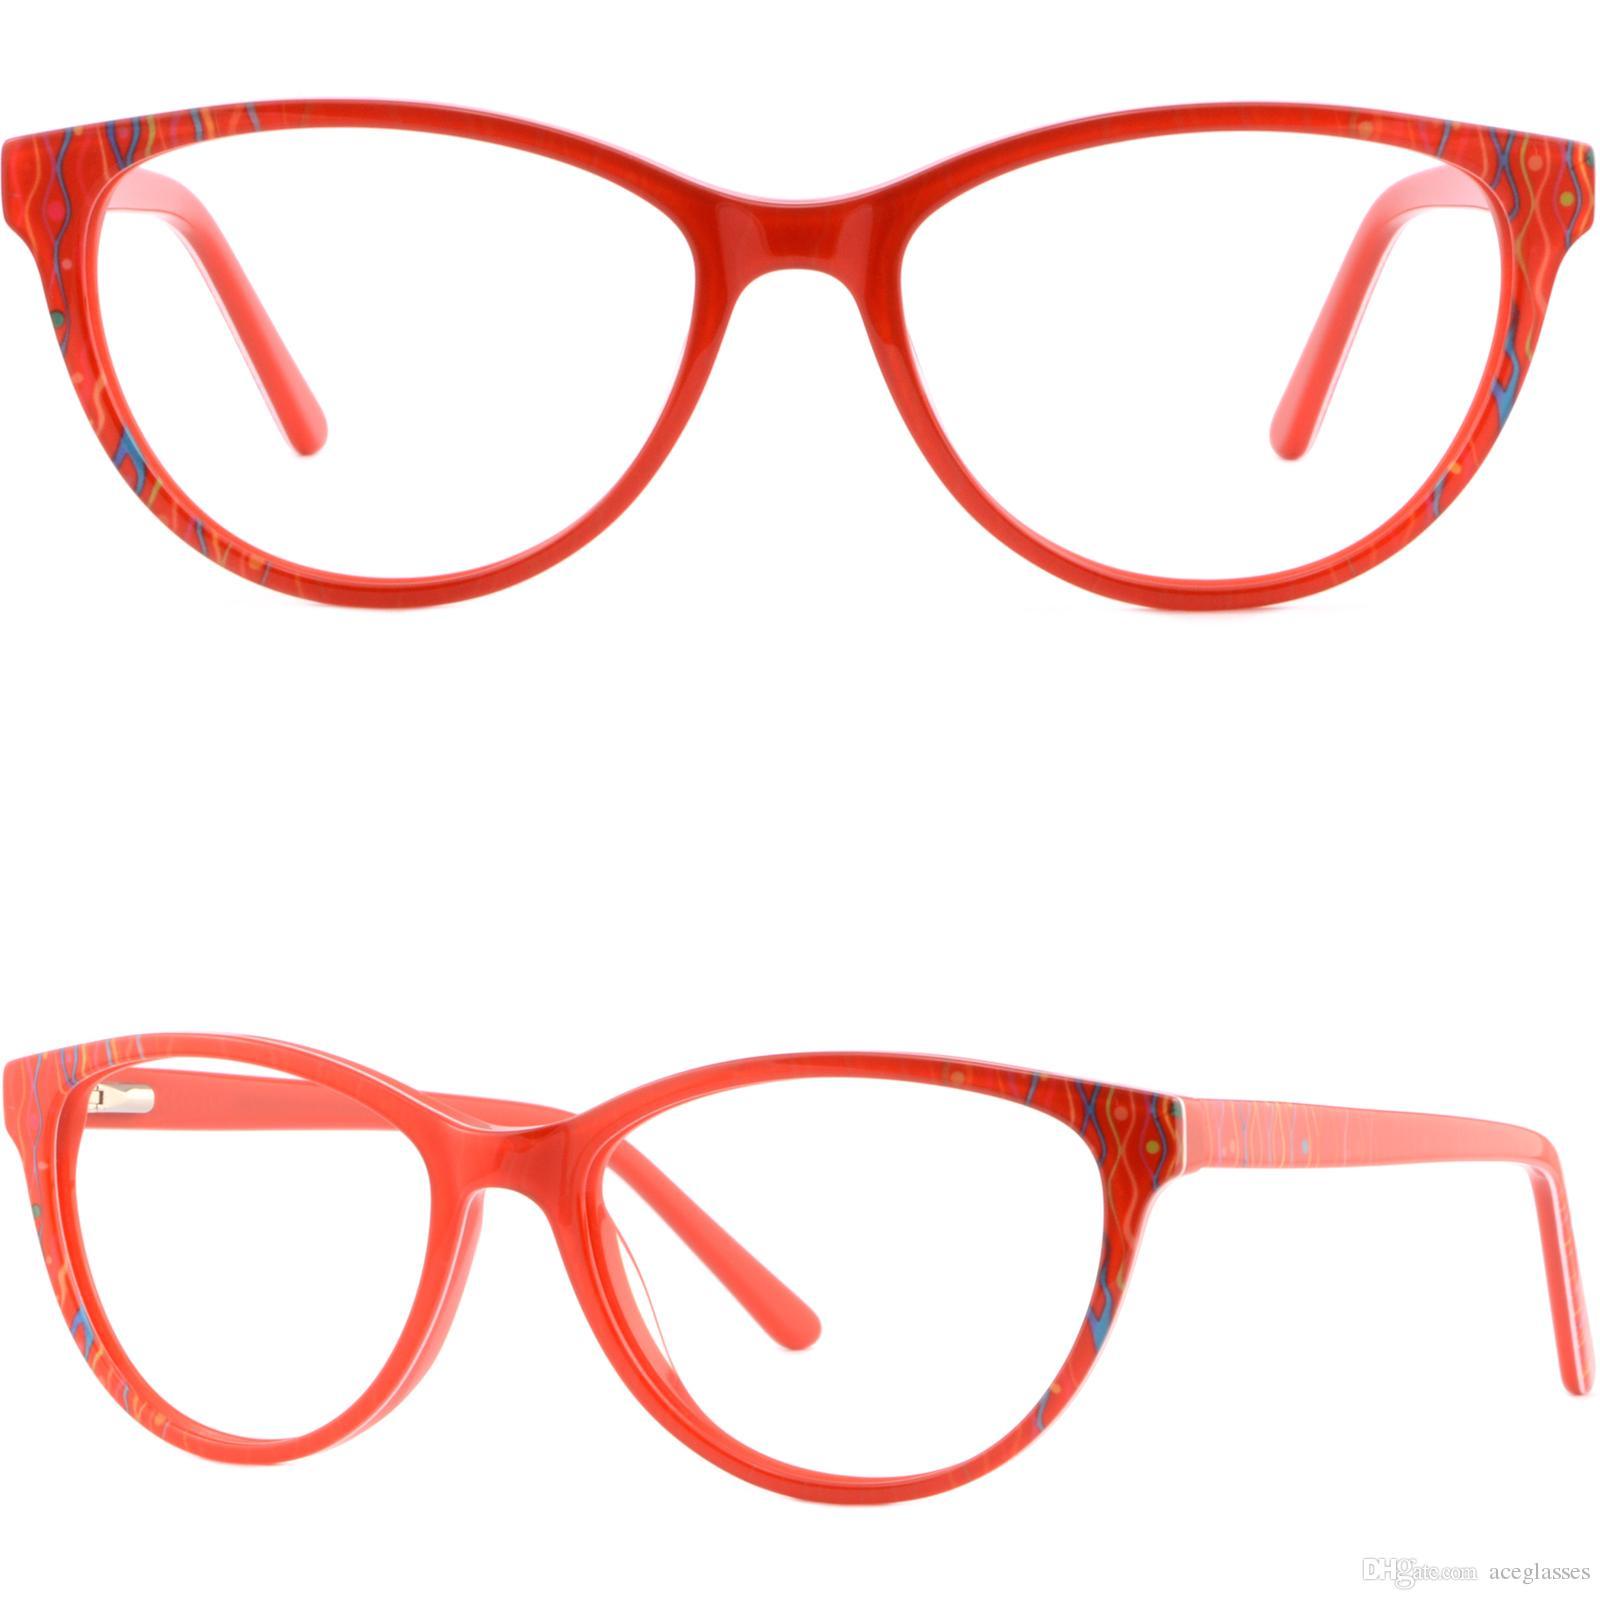 13f5f731eaa0 Red Full Rim Plastic Women's Frame Prescription Glasses Sunglasses ...